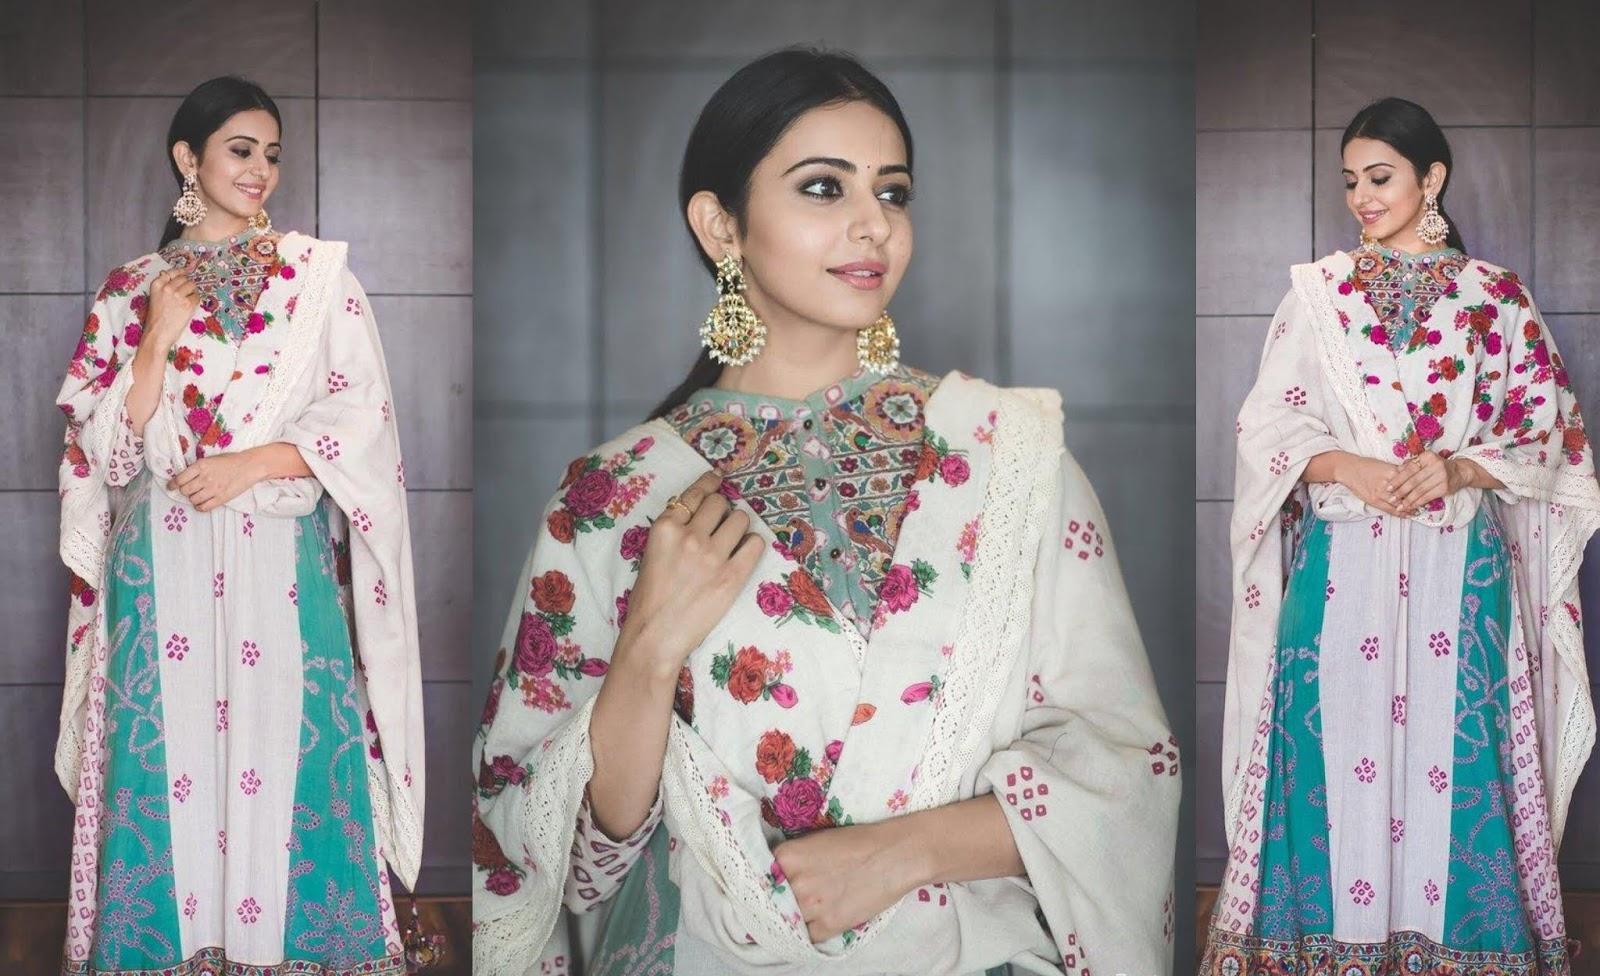 Beautiful Indian Model Rakul Preet Singh Photos For Wedding Event